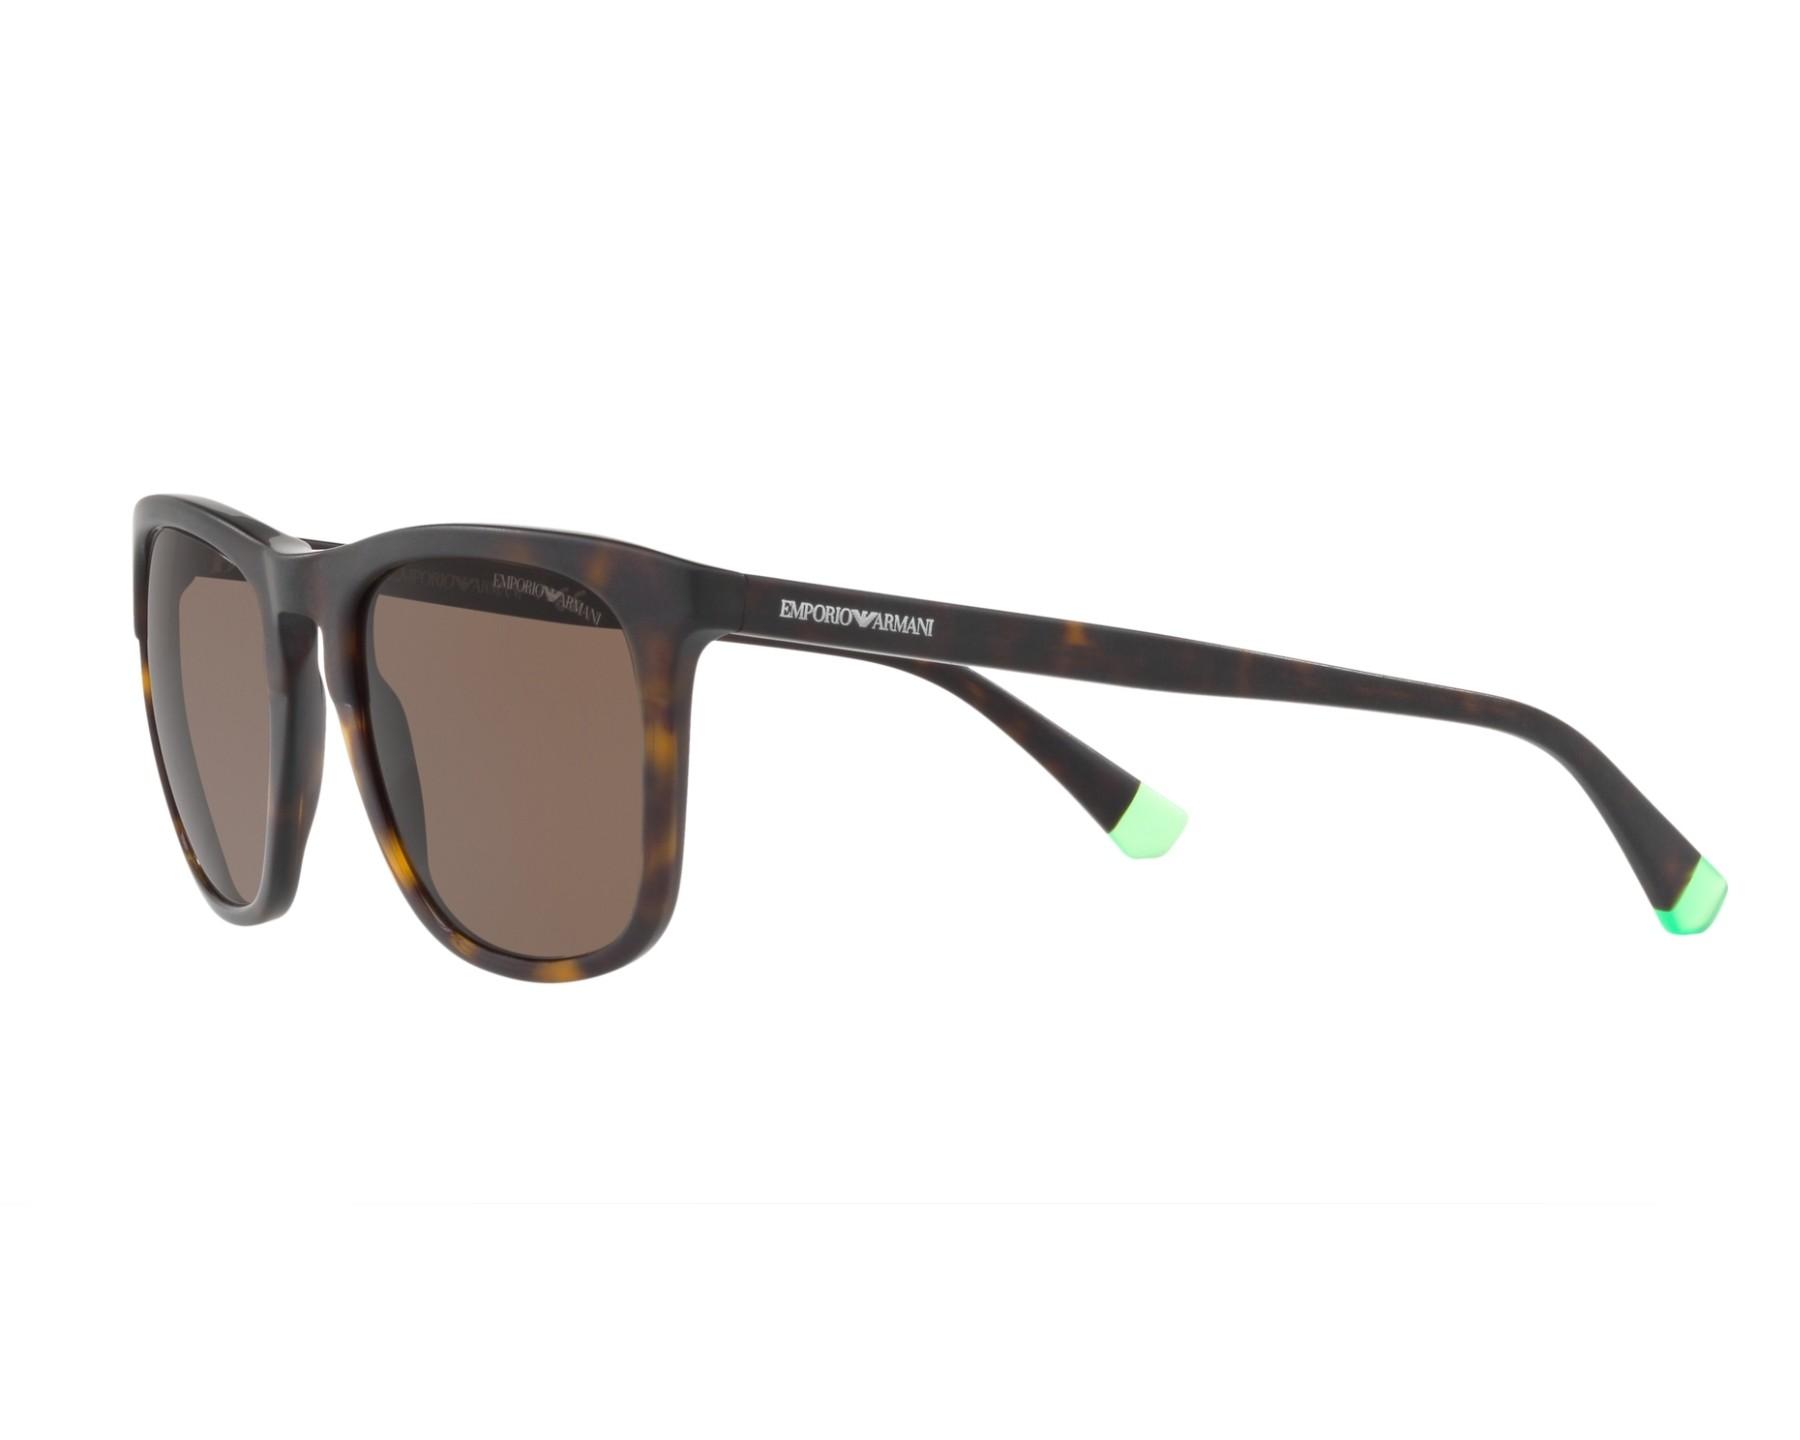 Sunglasses Emporio Armani EA-4105 508973 53-20 Havana 360 degree view 3 3b94be2113